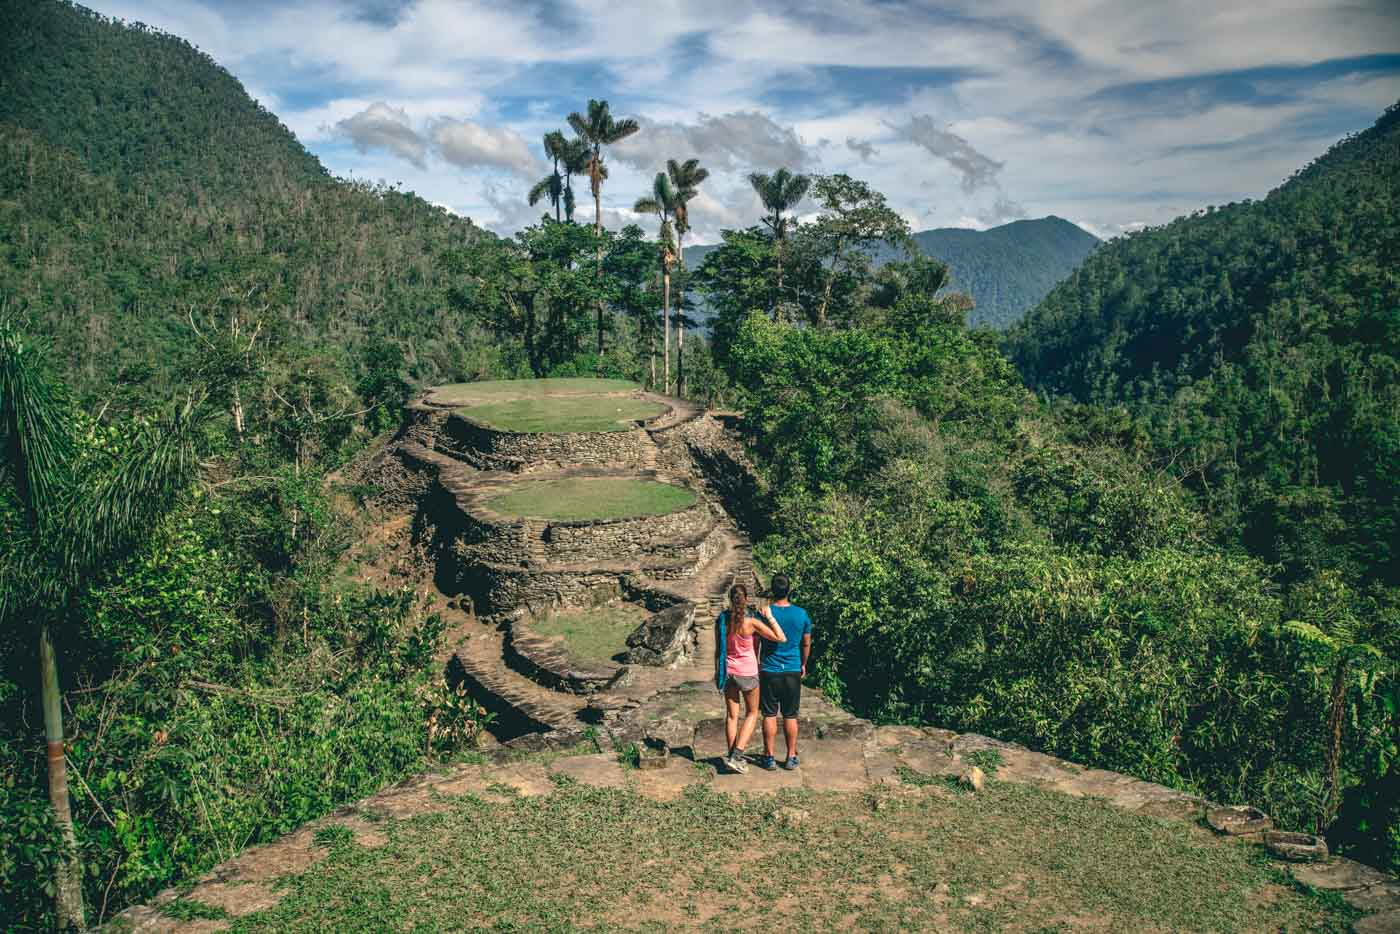 Travel in Colombia. Lost City, Santa Marta, Colombia